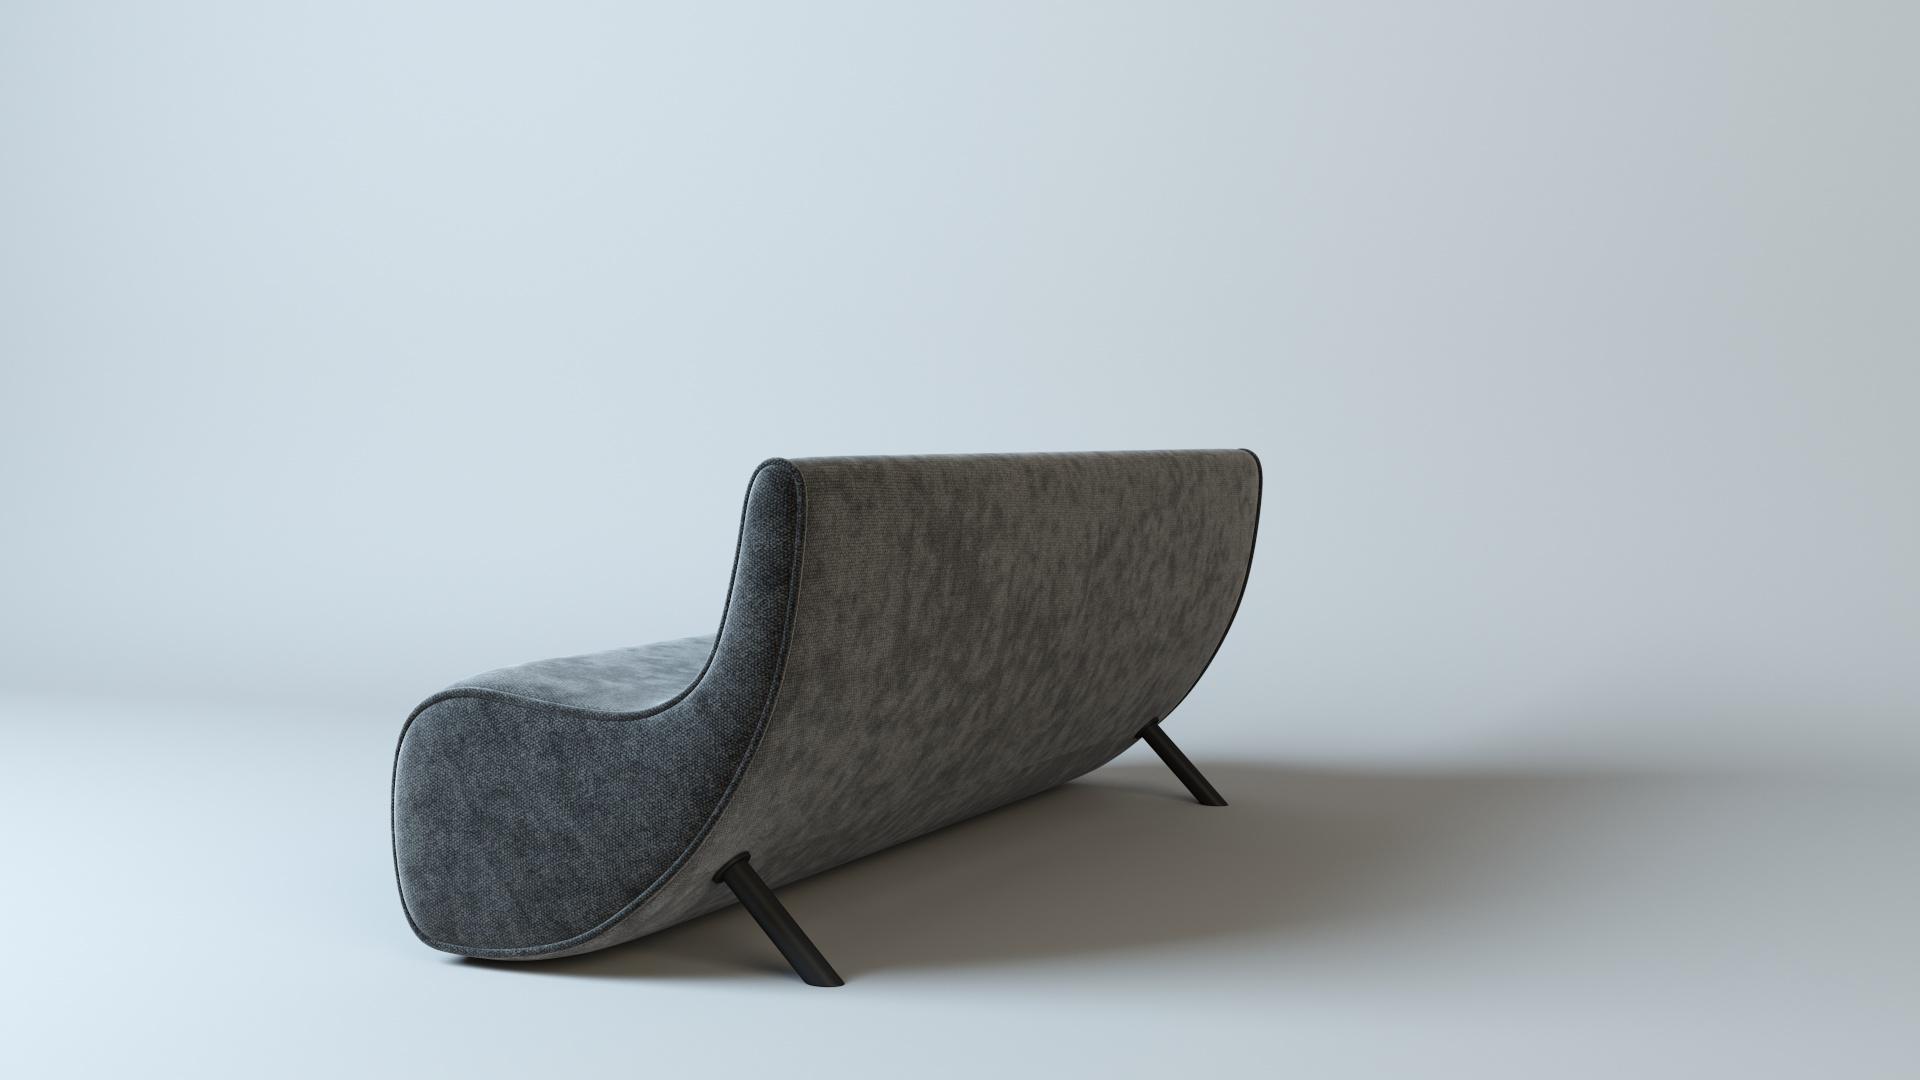 Sympathisch Sofa Alcantara Galerie Von In Addition To The Concept Of The